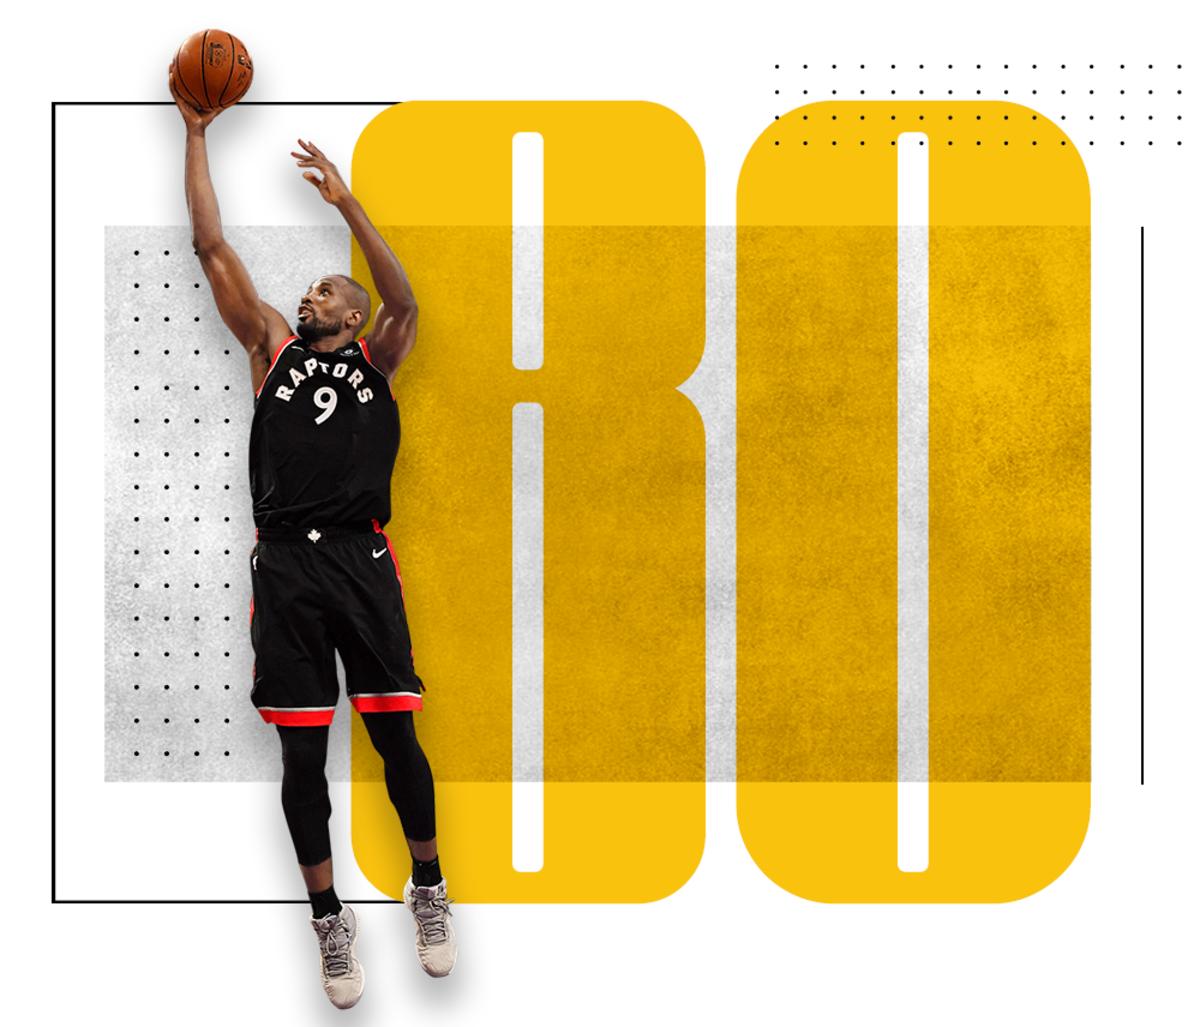 top-100-nba-players-2020-Serge-Ibaka.png